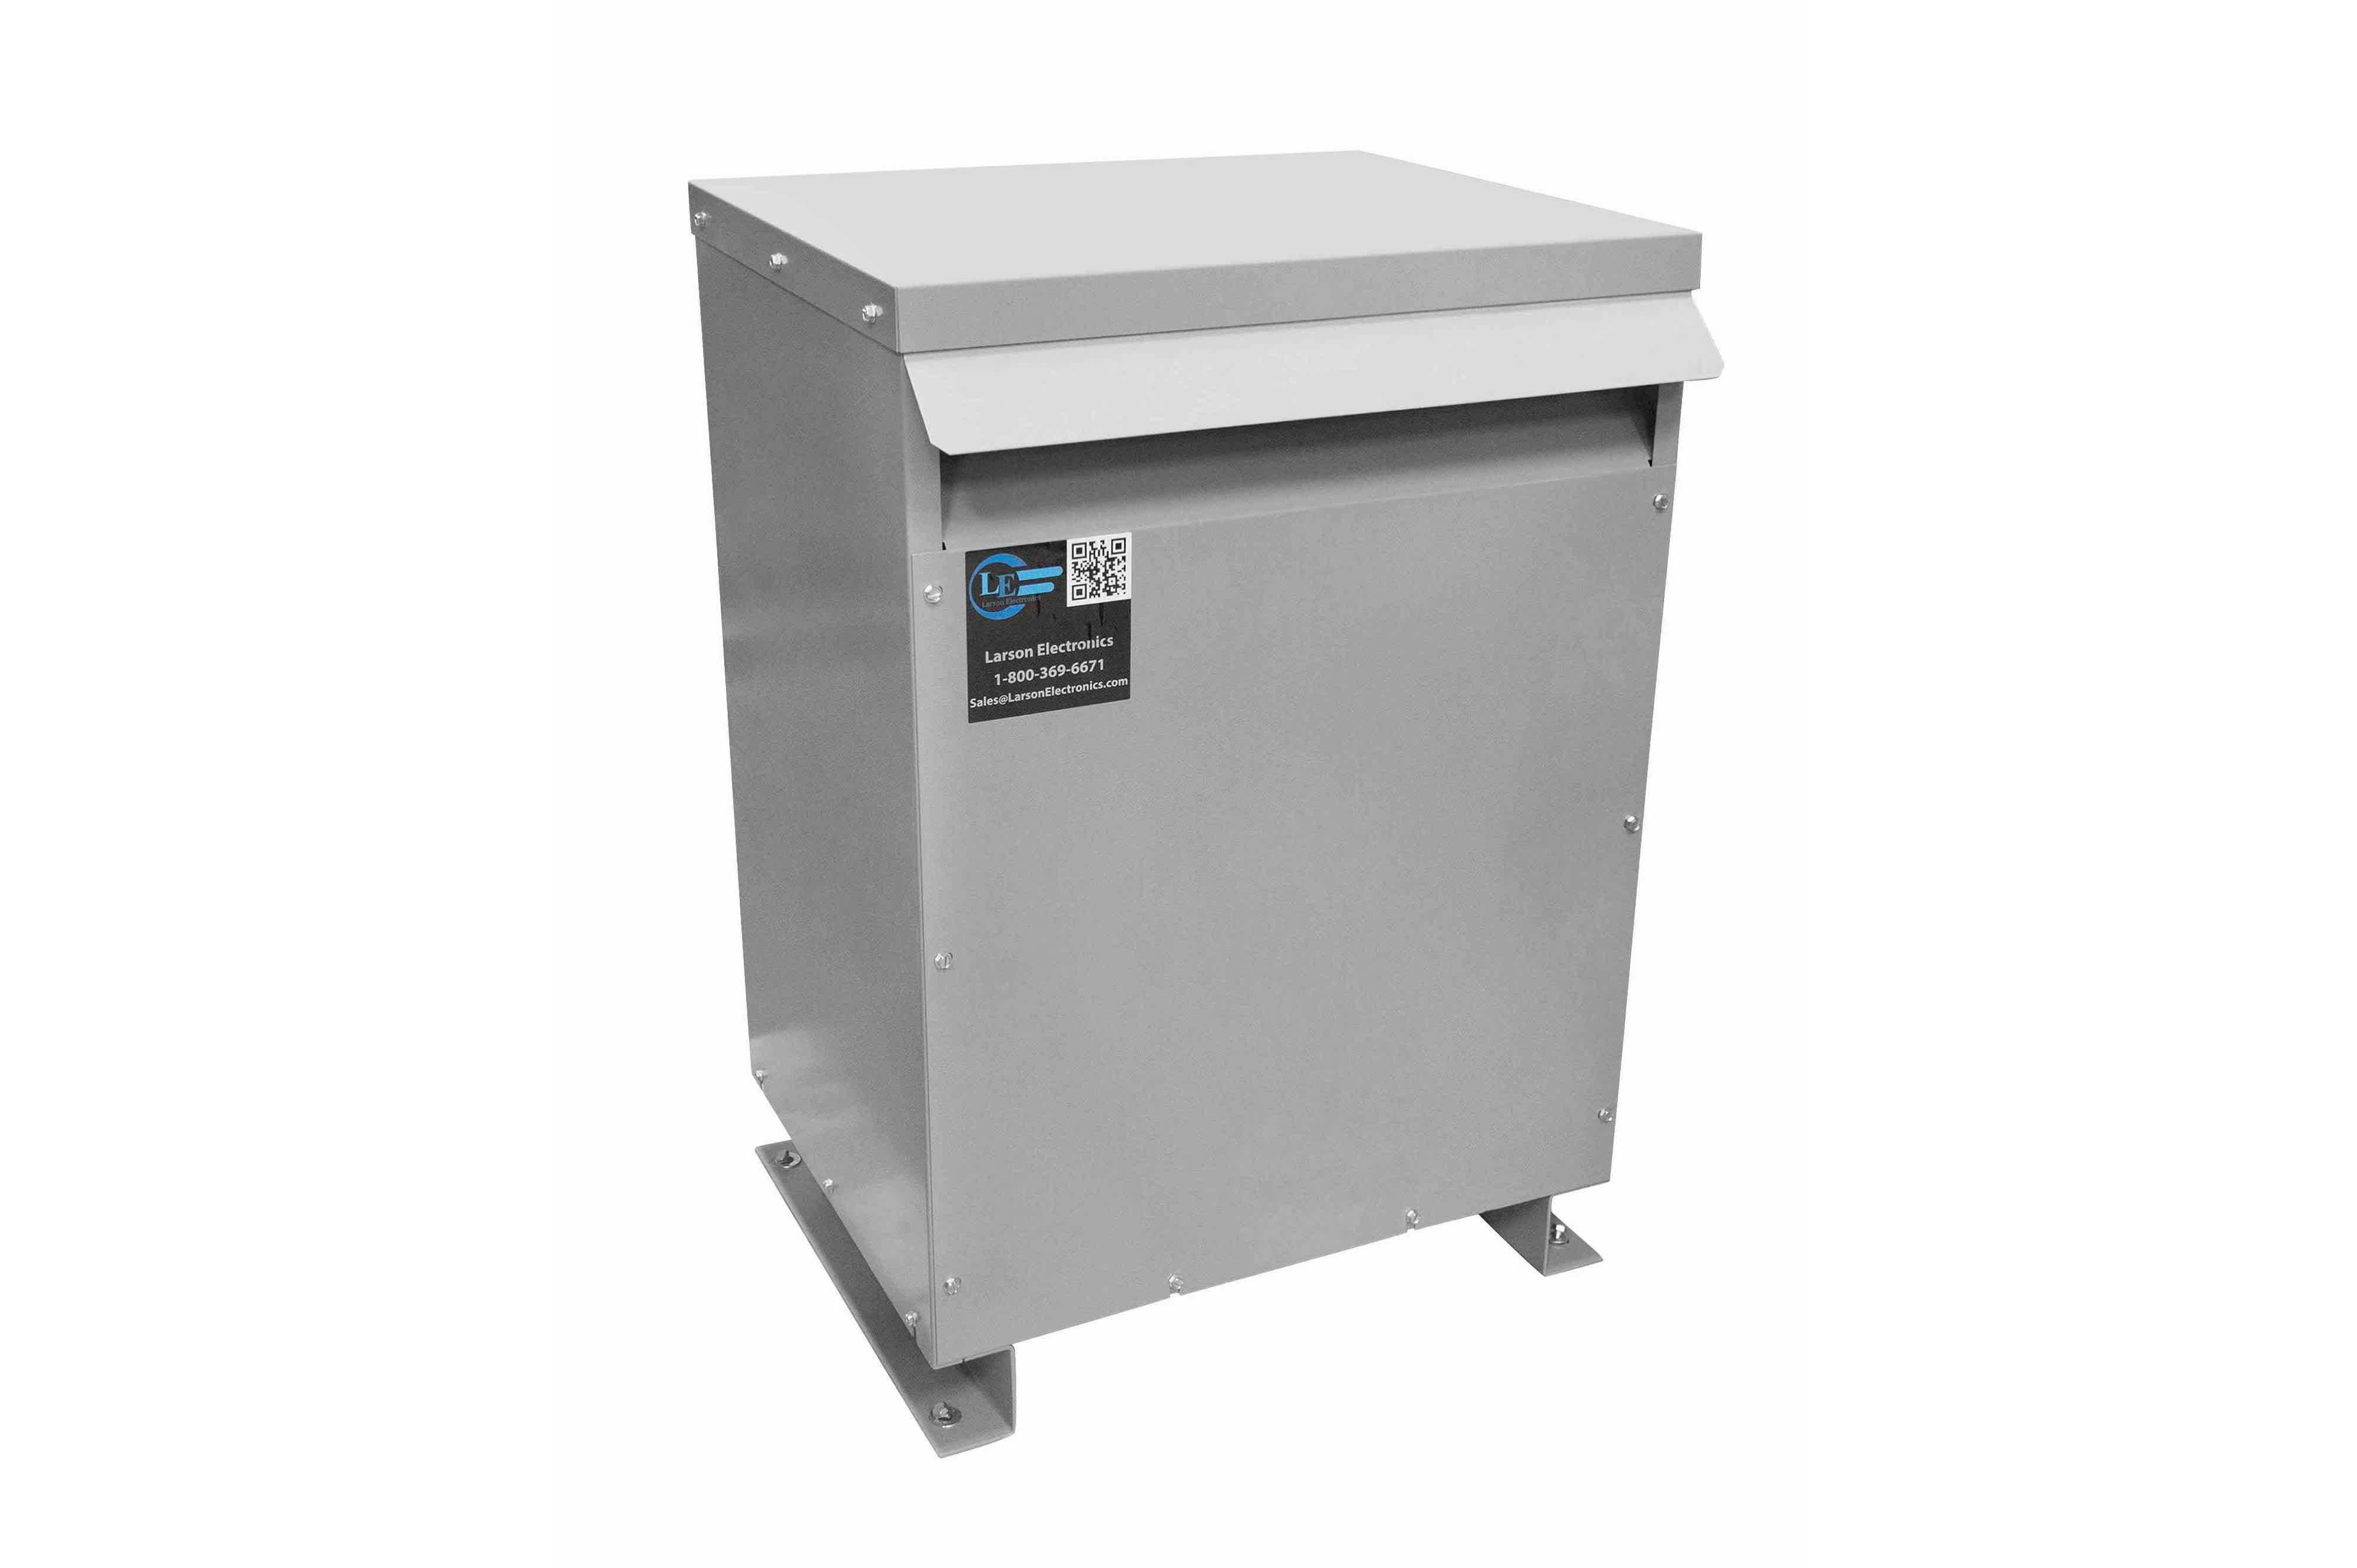 1000 kVA 3PH Isolation Transformer, 240V Wye Primary, 380V Delta Secondary, N3R, Ventilated, 60 Hz